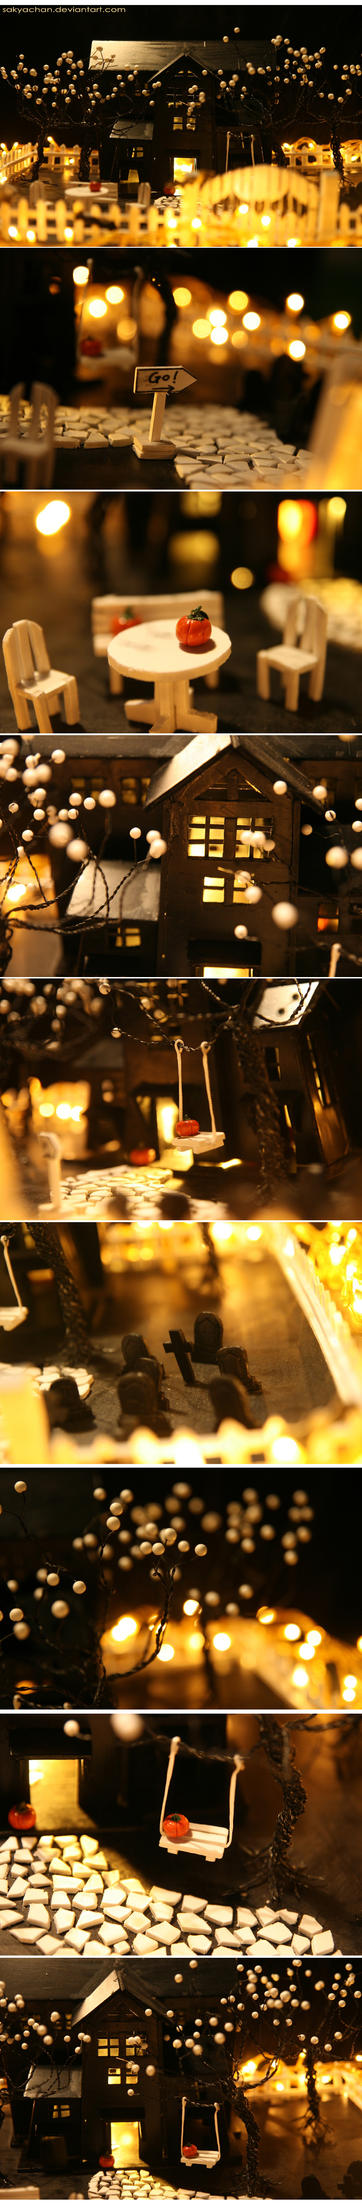 .:DECOR:. HALLOWEEN HOUSE NO 2 by sakyachan